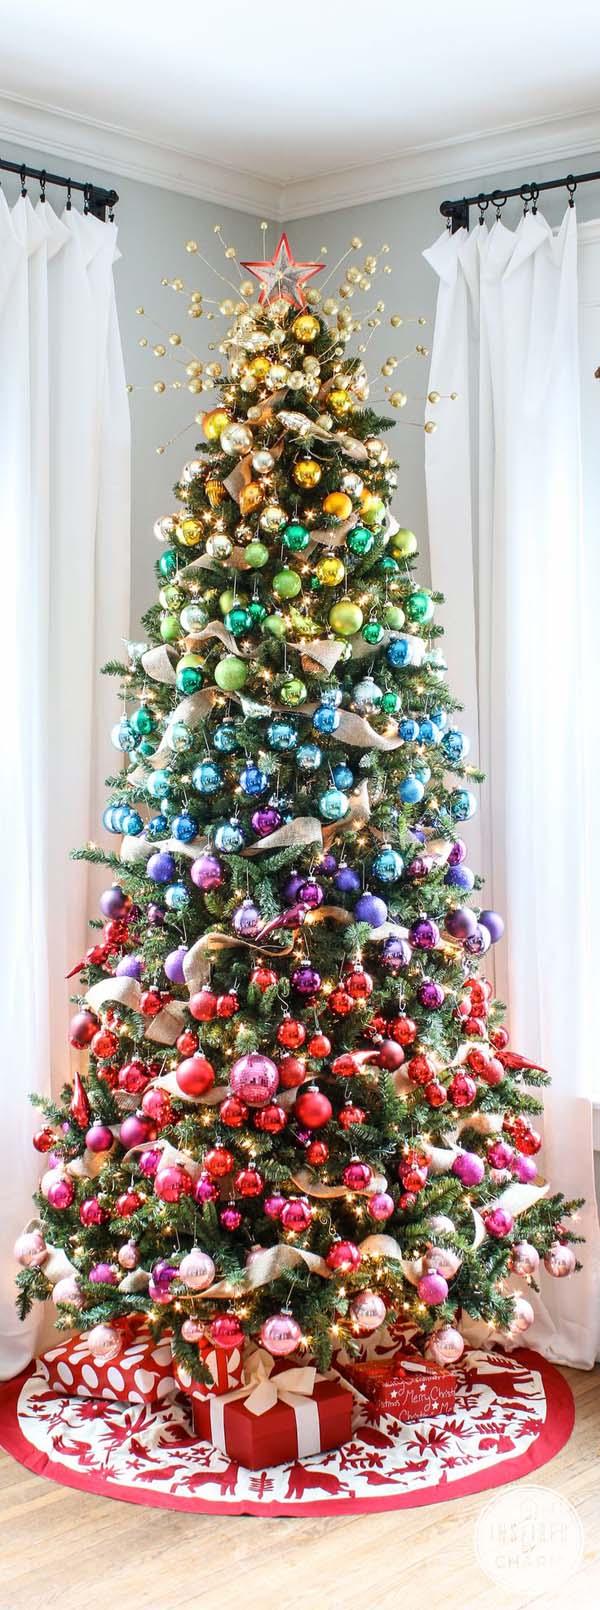 Beautiful Christmas Tree Decorations Ideas - Christmas Celebration ...